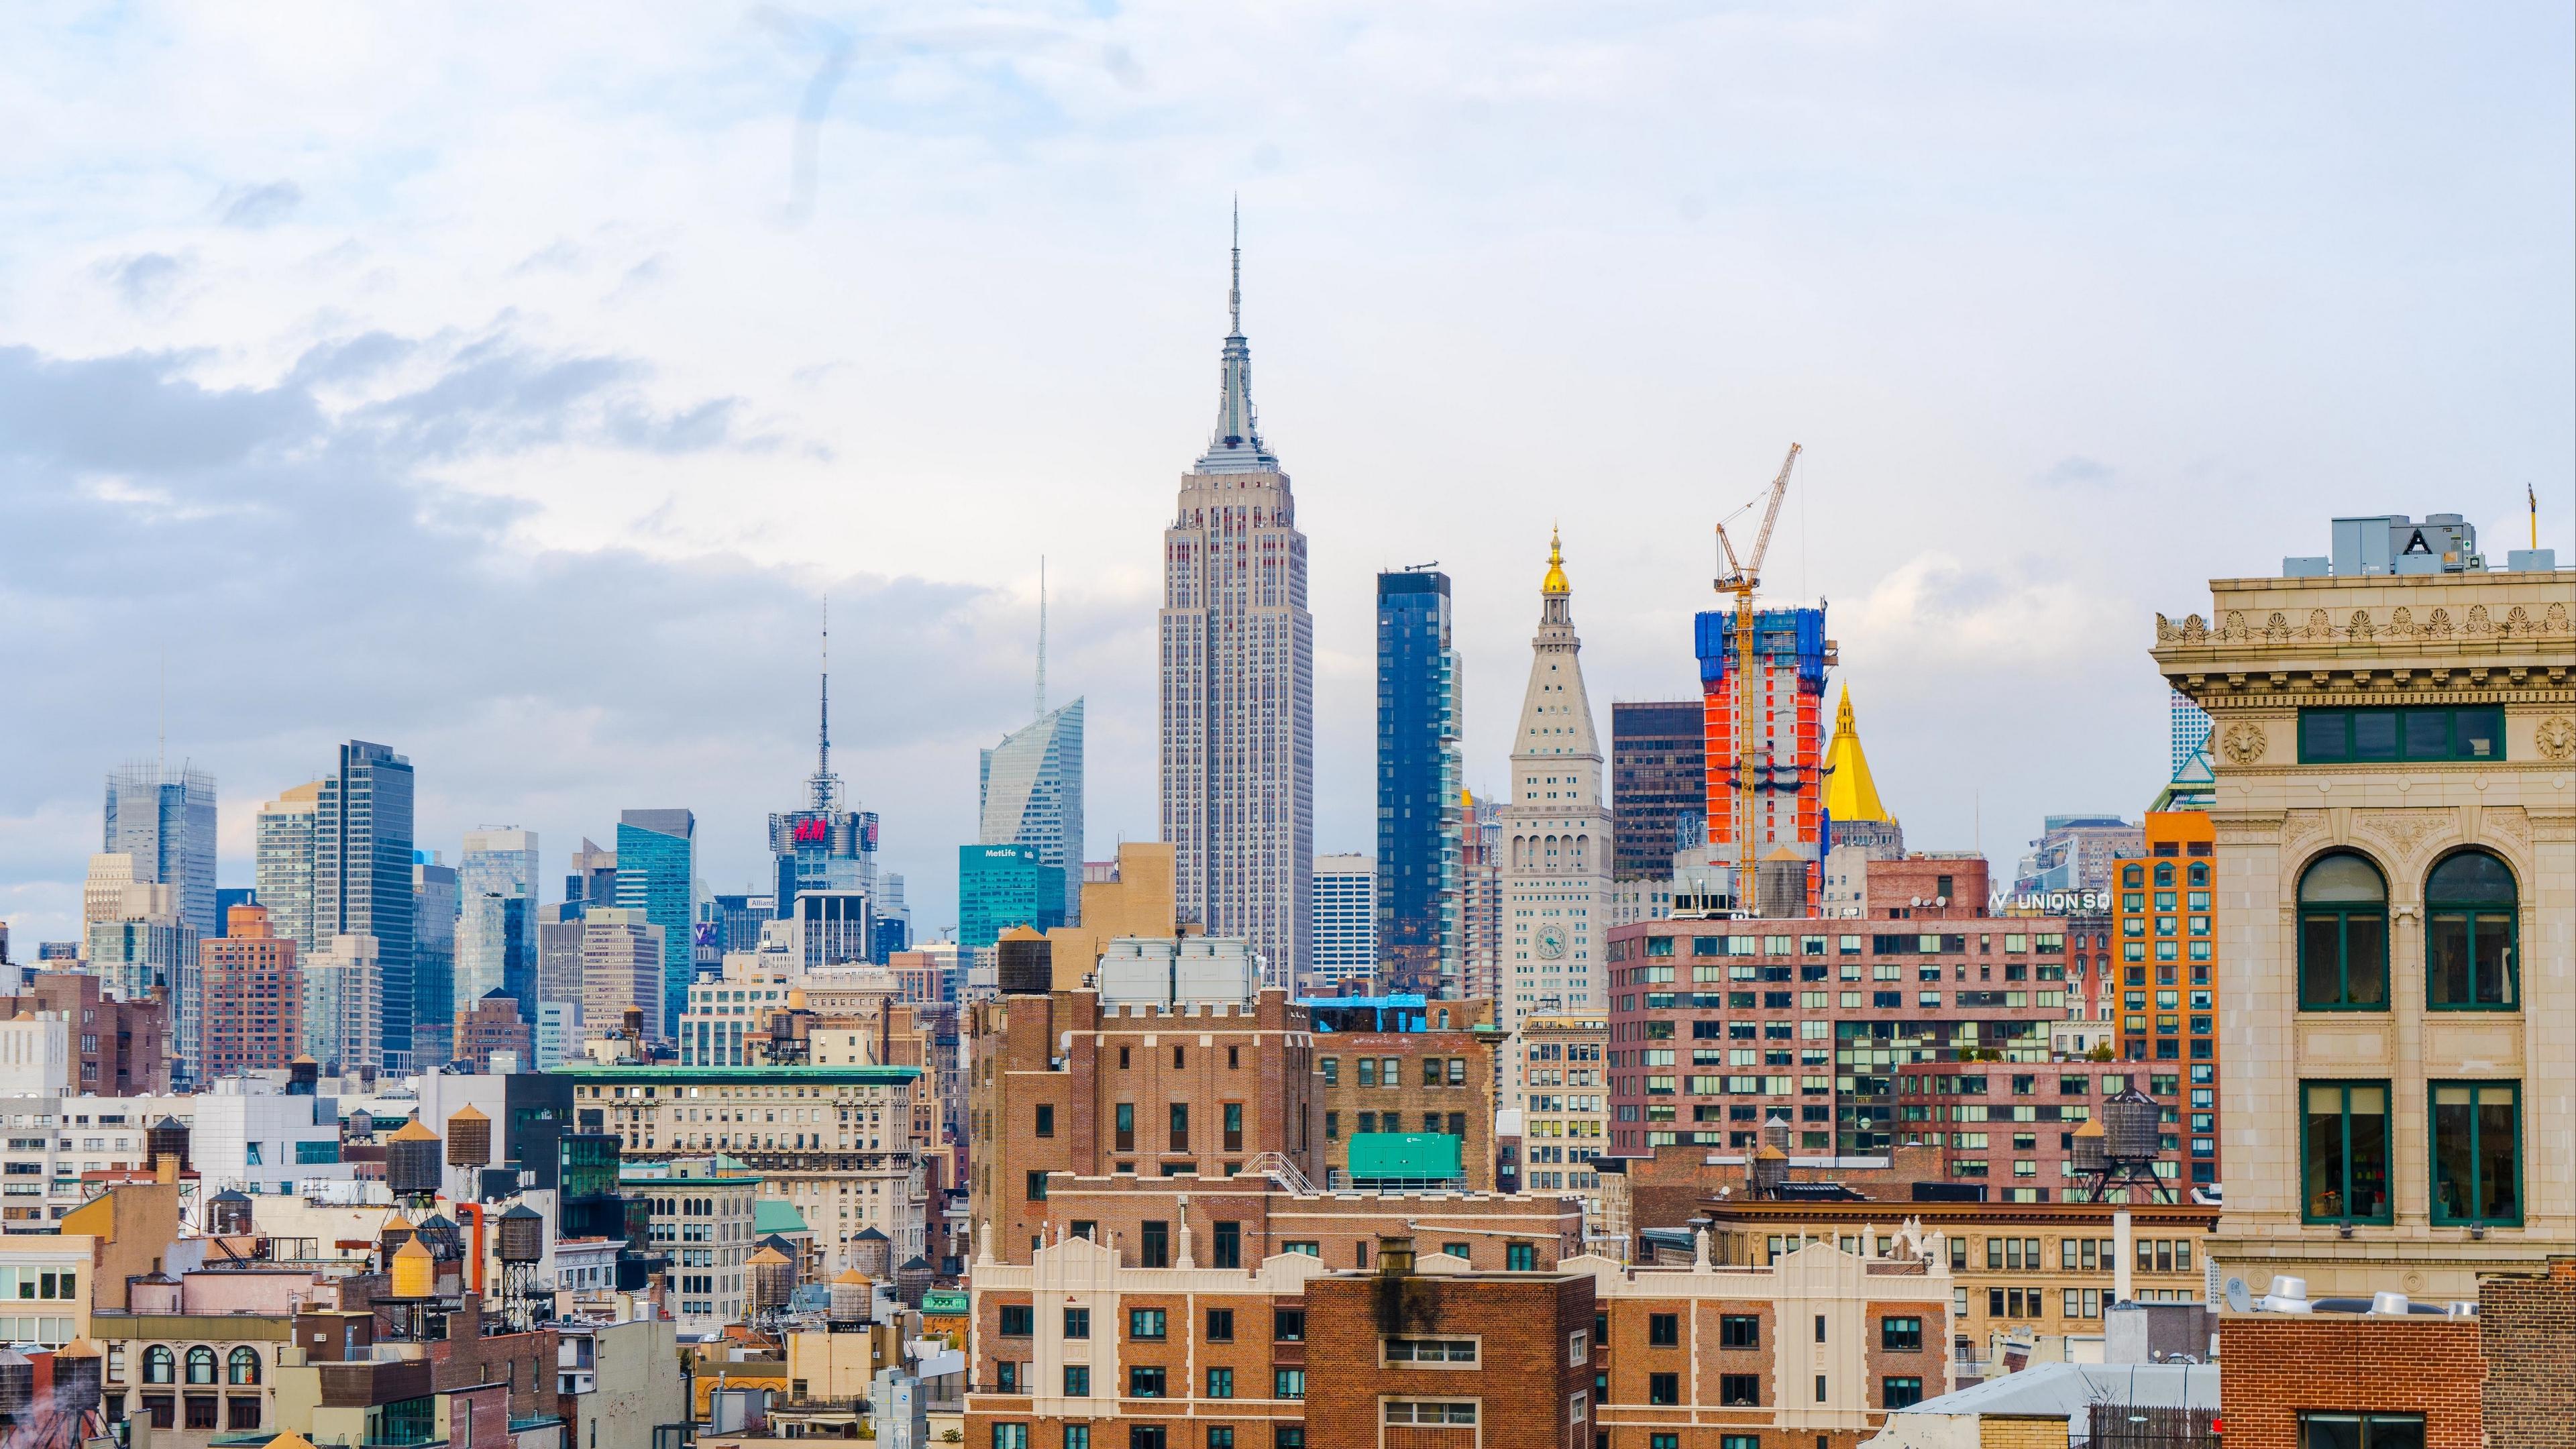 new york usa skyscrapers buildings 4k 1538067933 - new york, usa, skyscrapers, buildings 4k - USA, Skyscrapers, new york